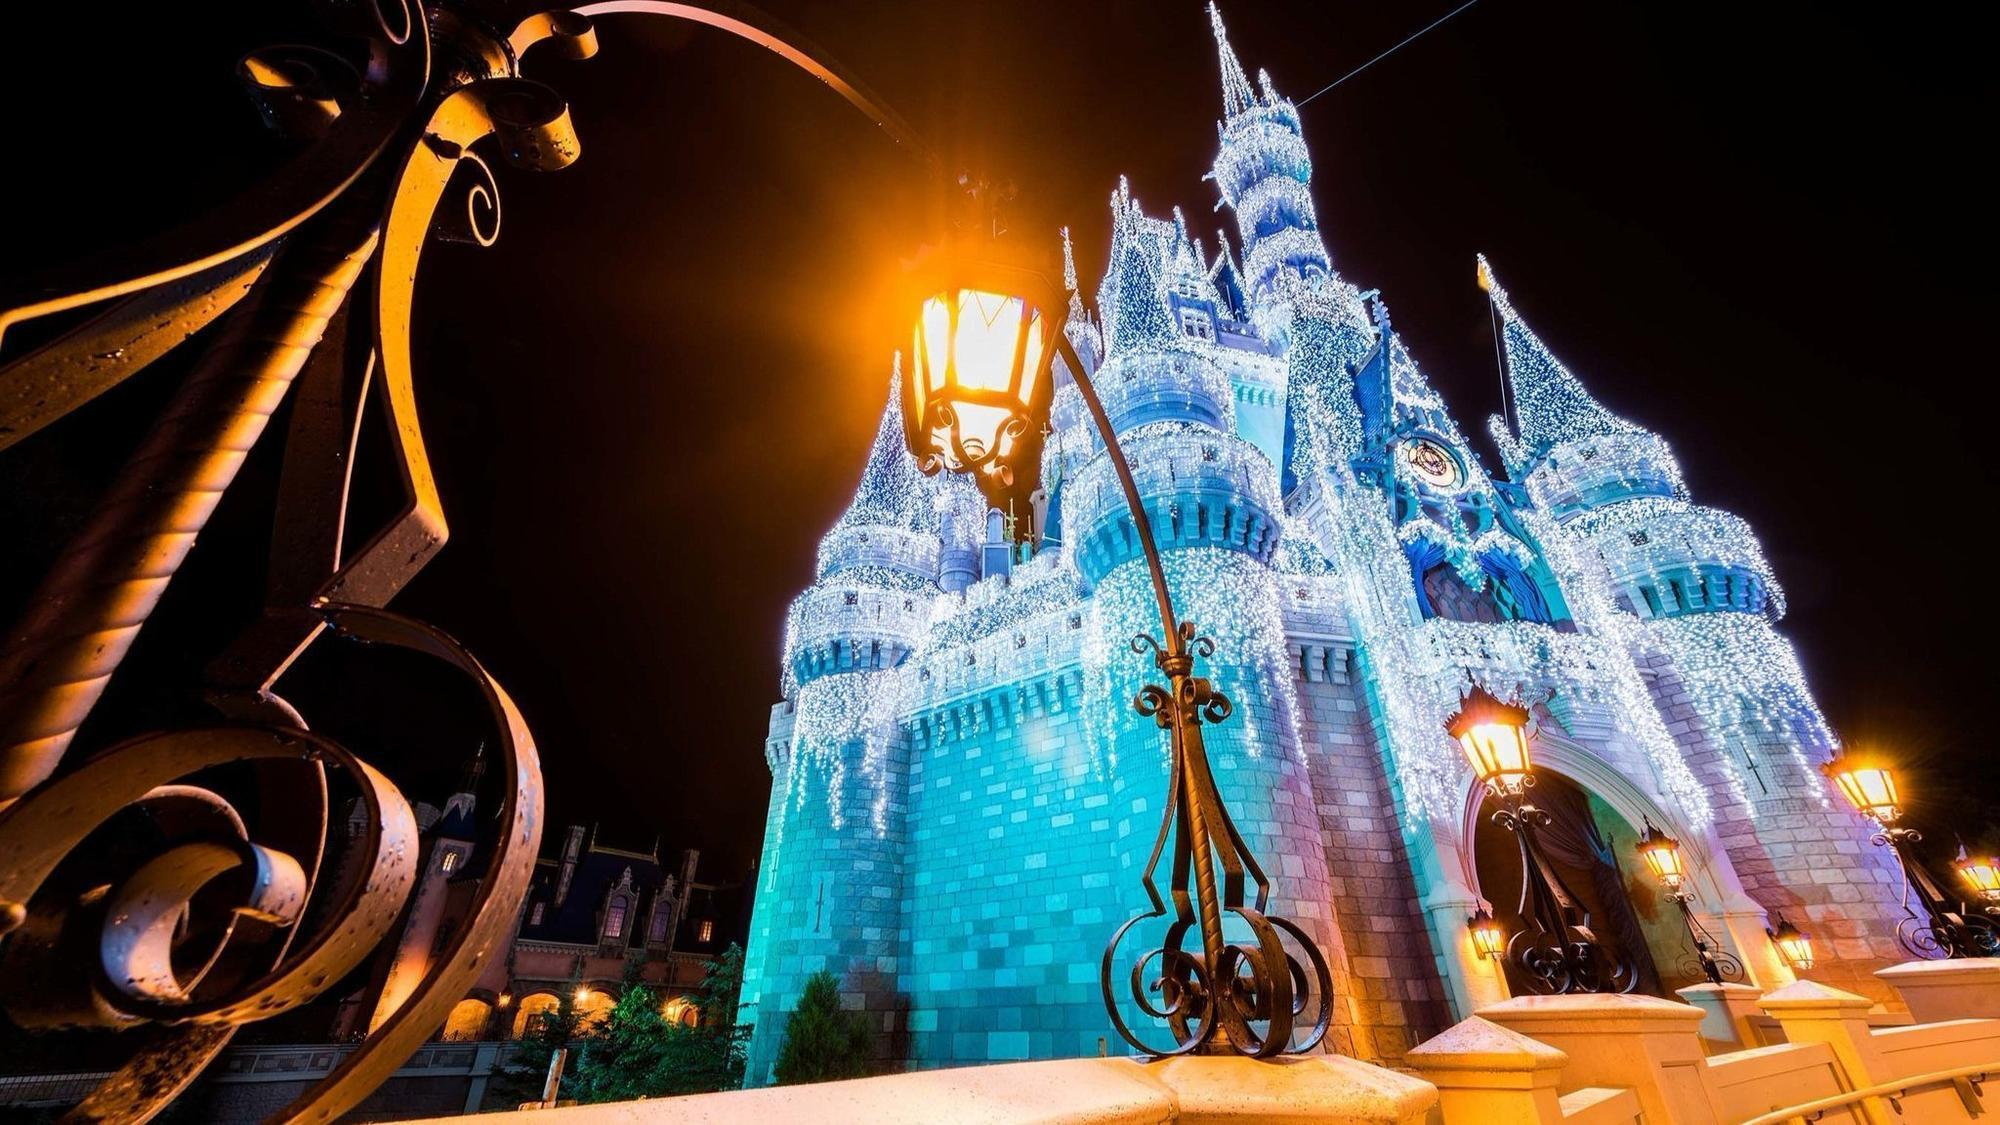 holidays at disney castle will light up and be livestreamed thursday orlando sentinel - Disney World Christmas Lights